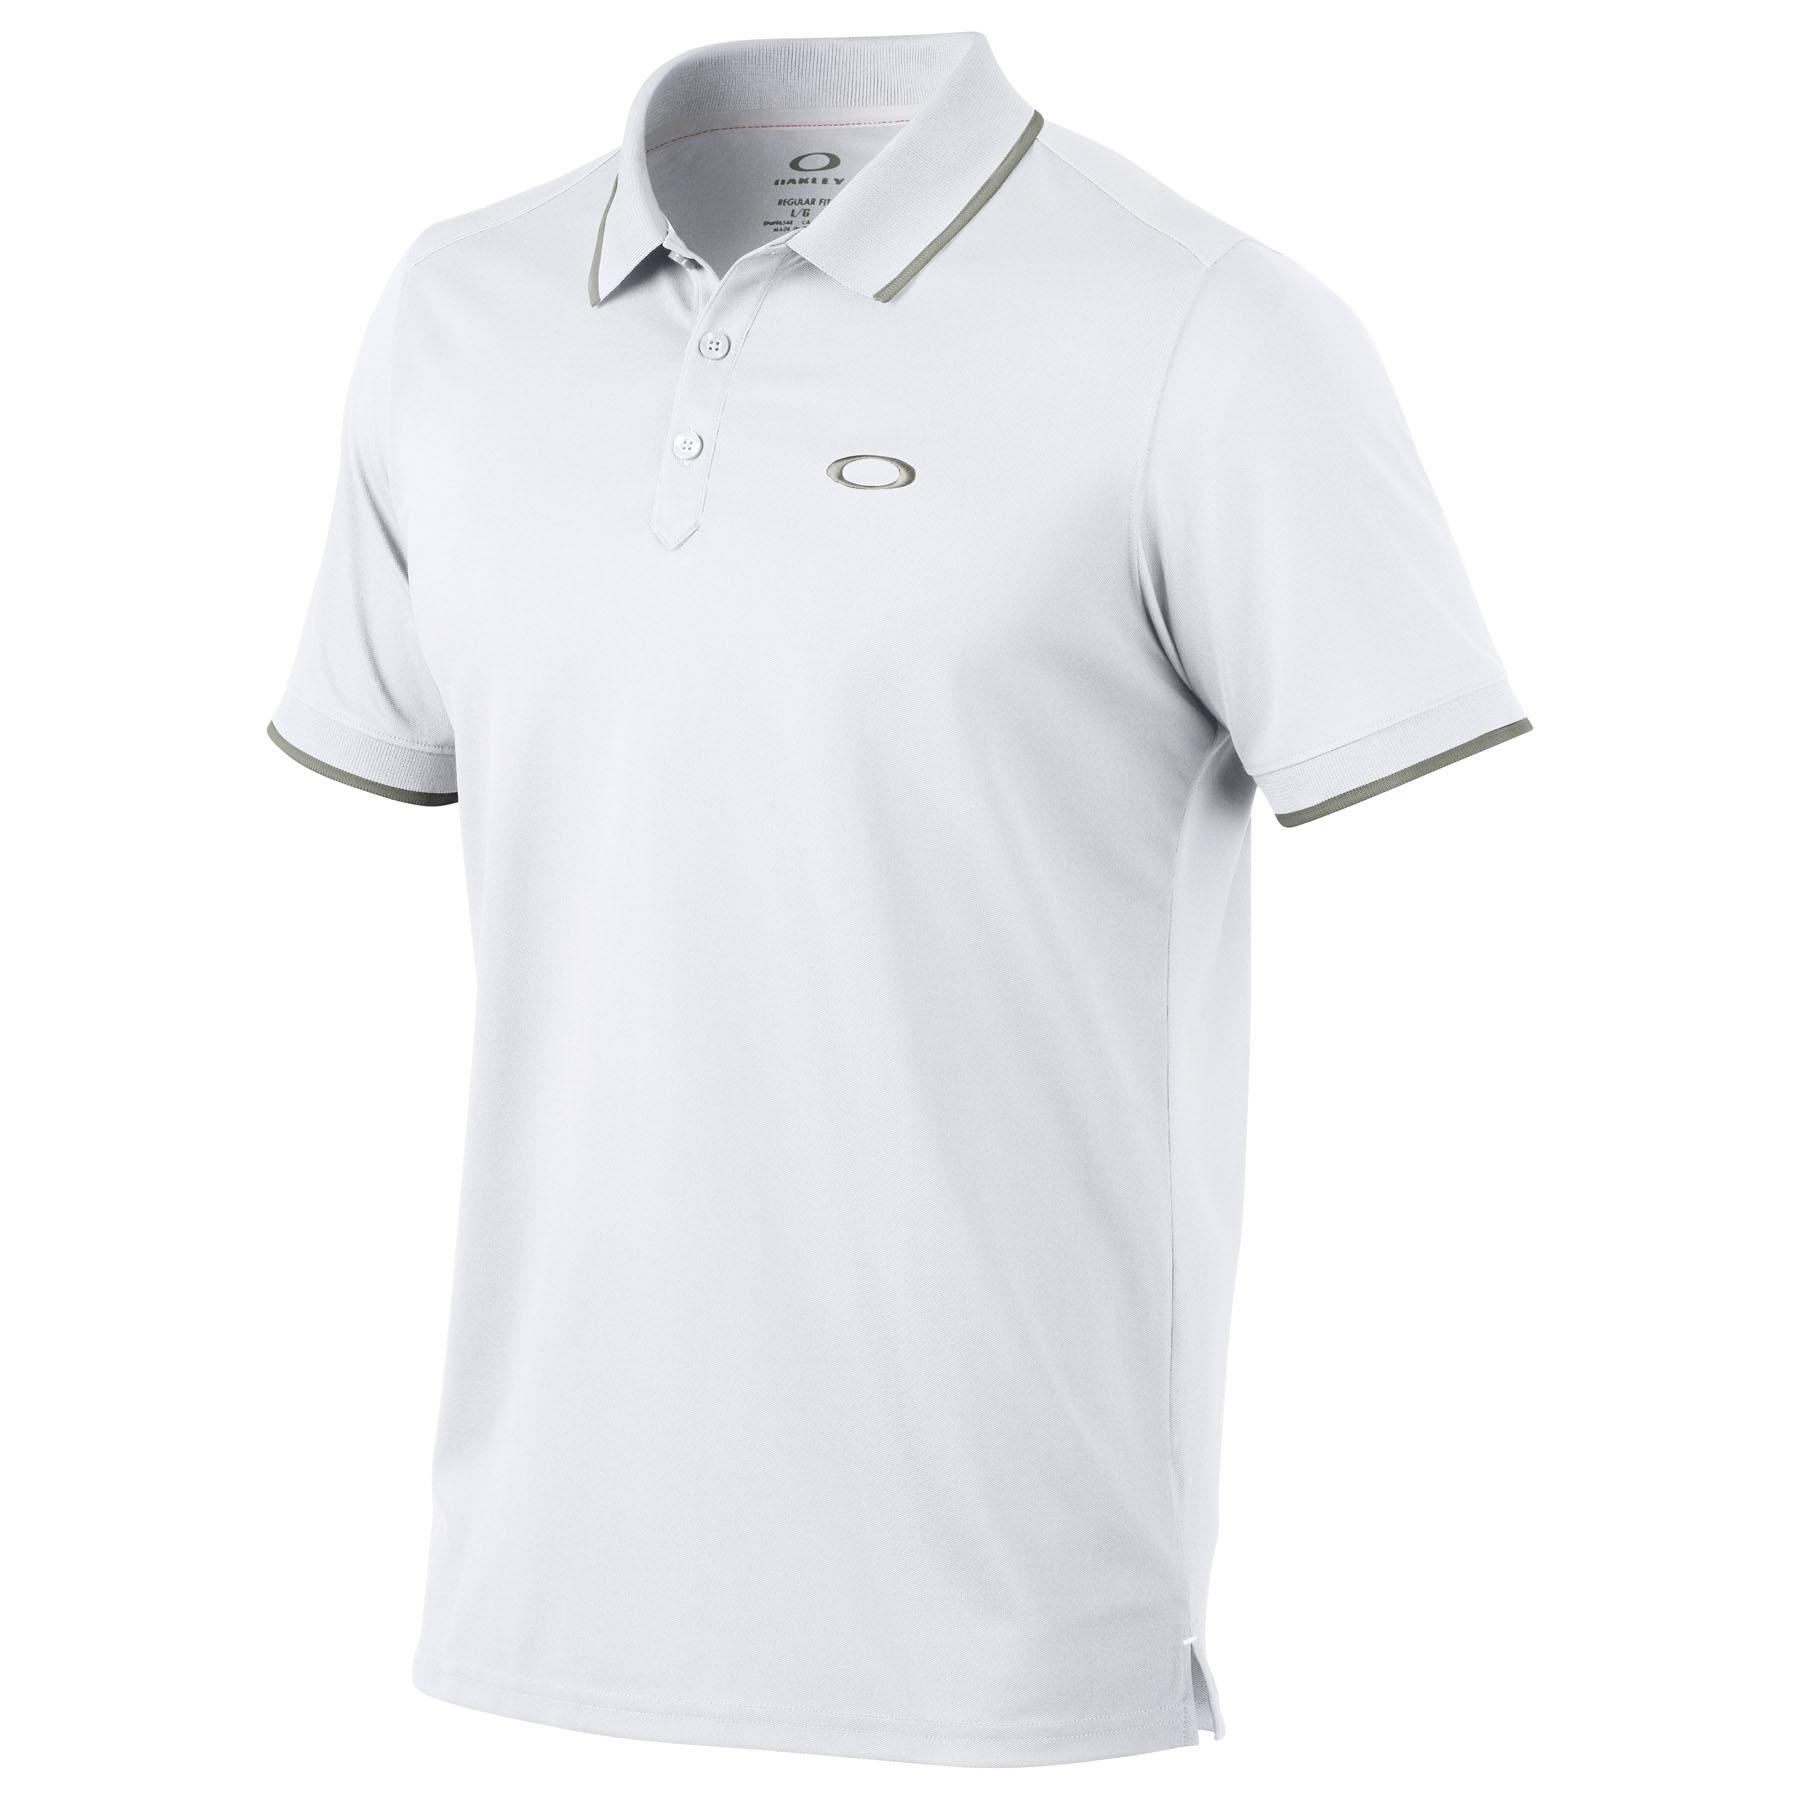 Oakley golf shirts bubba watson for Sligo golf shirts discount